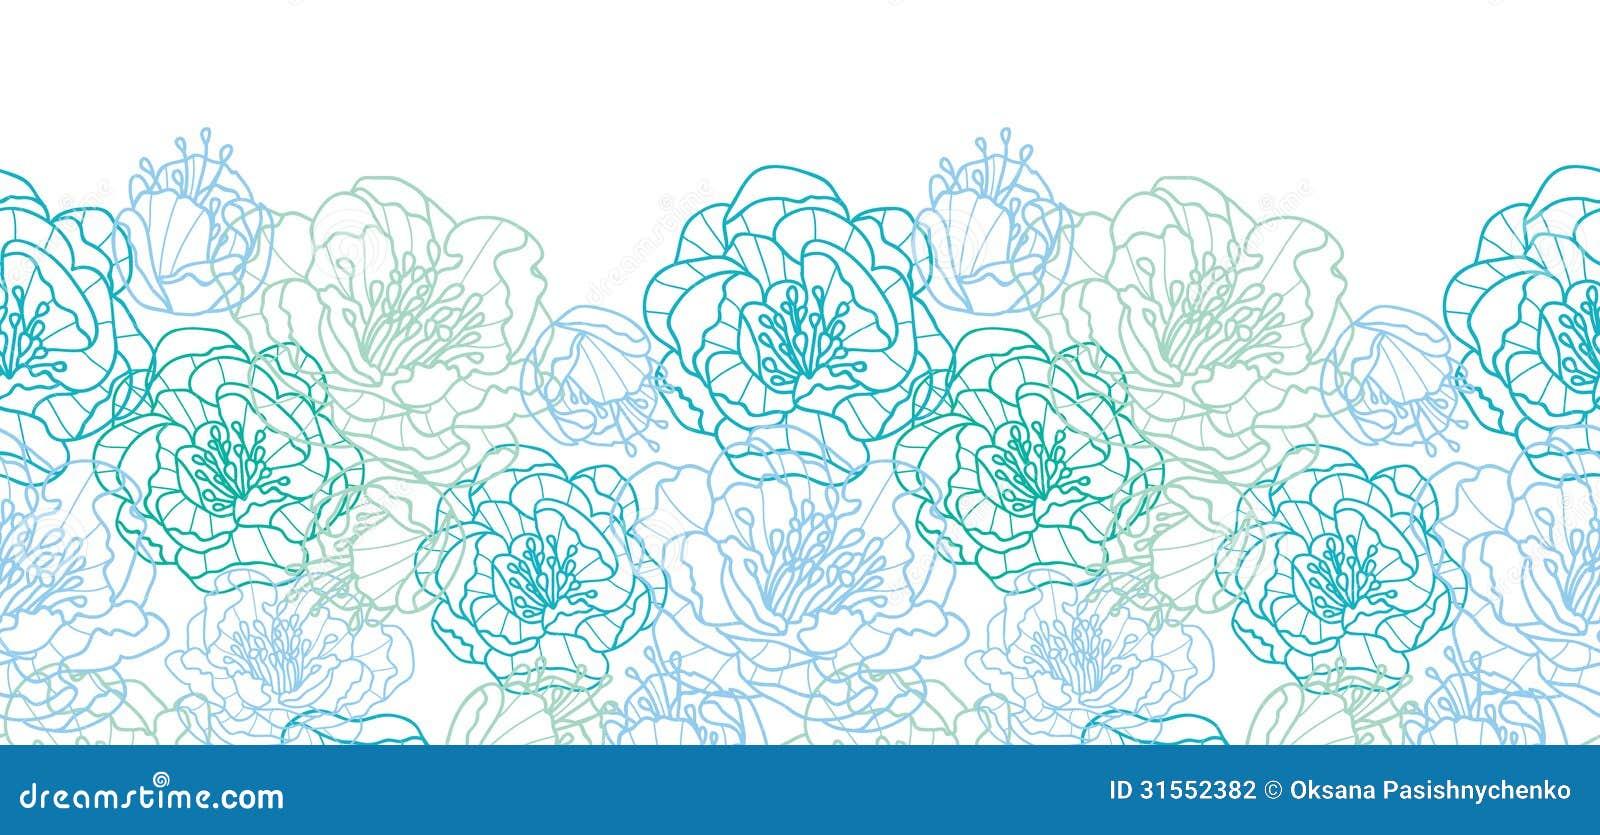 Line Art Design Background : Blue line art flowers horizontal seamless pattern stock